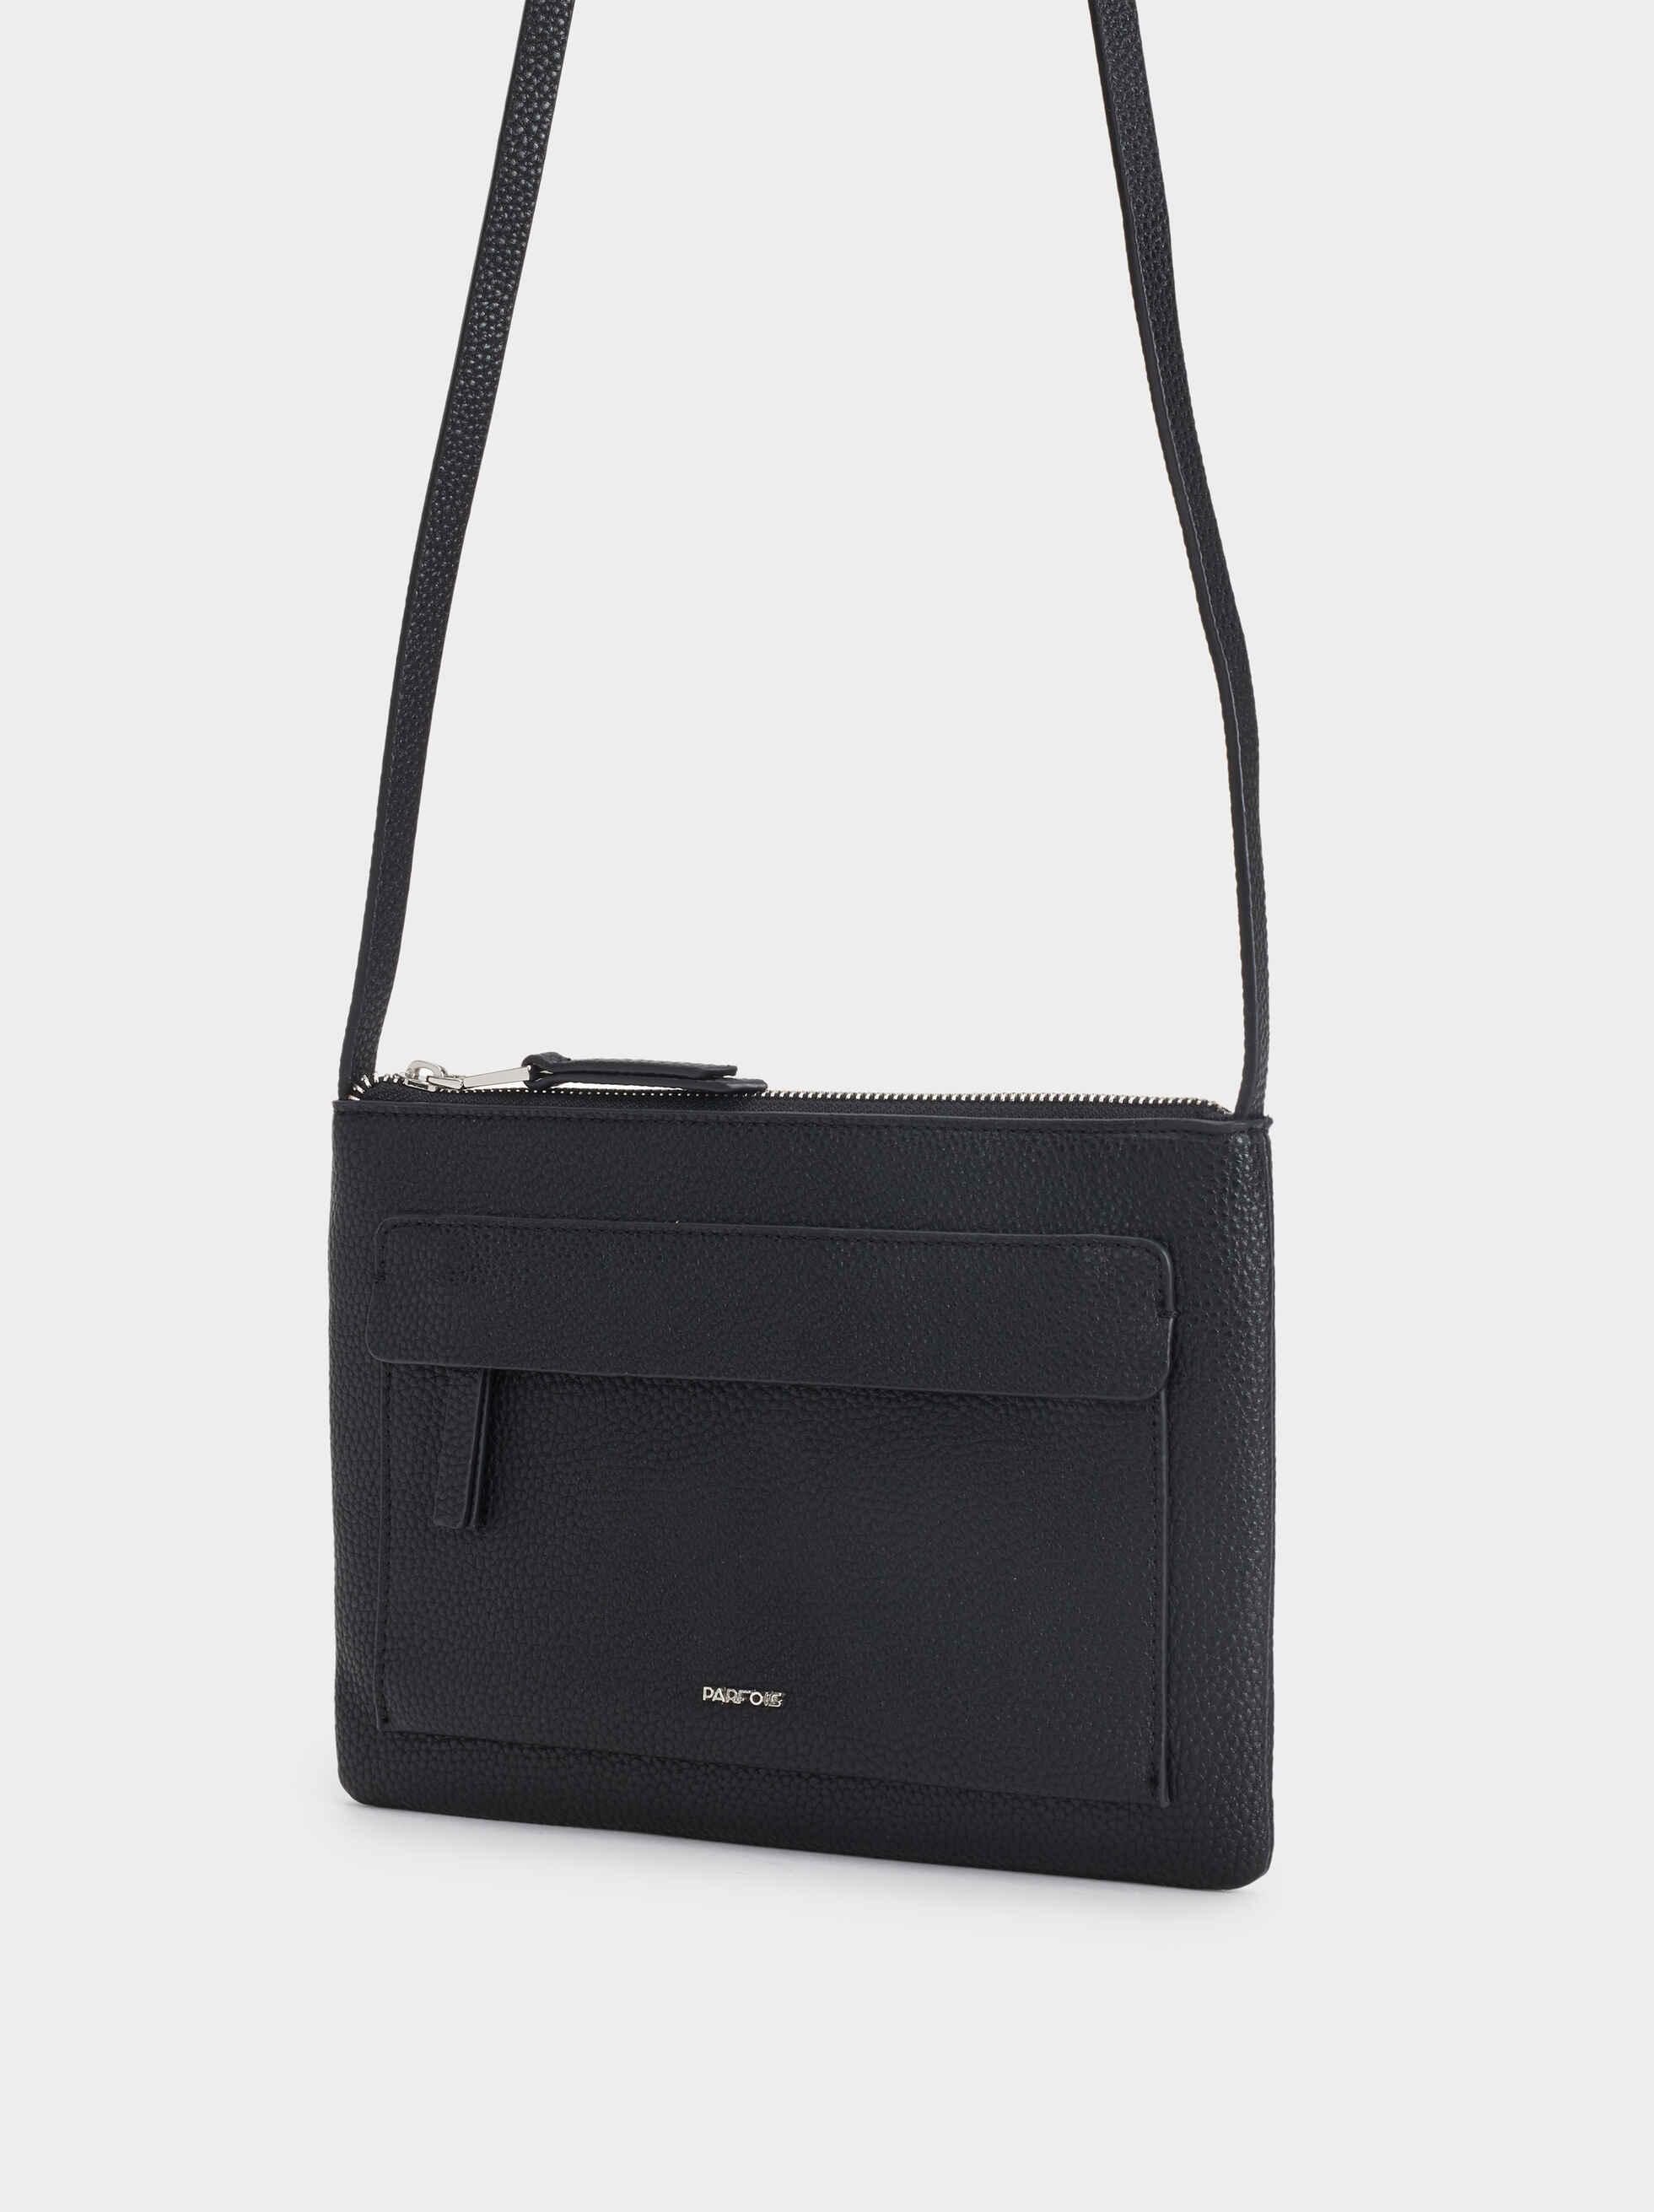 Crossbody Bag With Outer Pocket, Black, hi-res